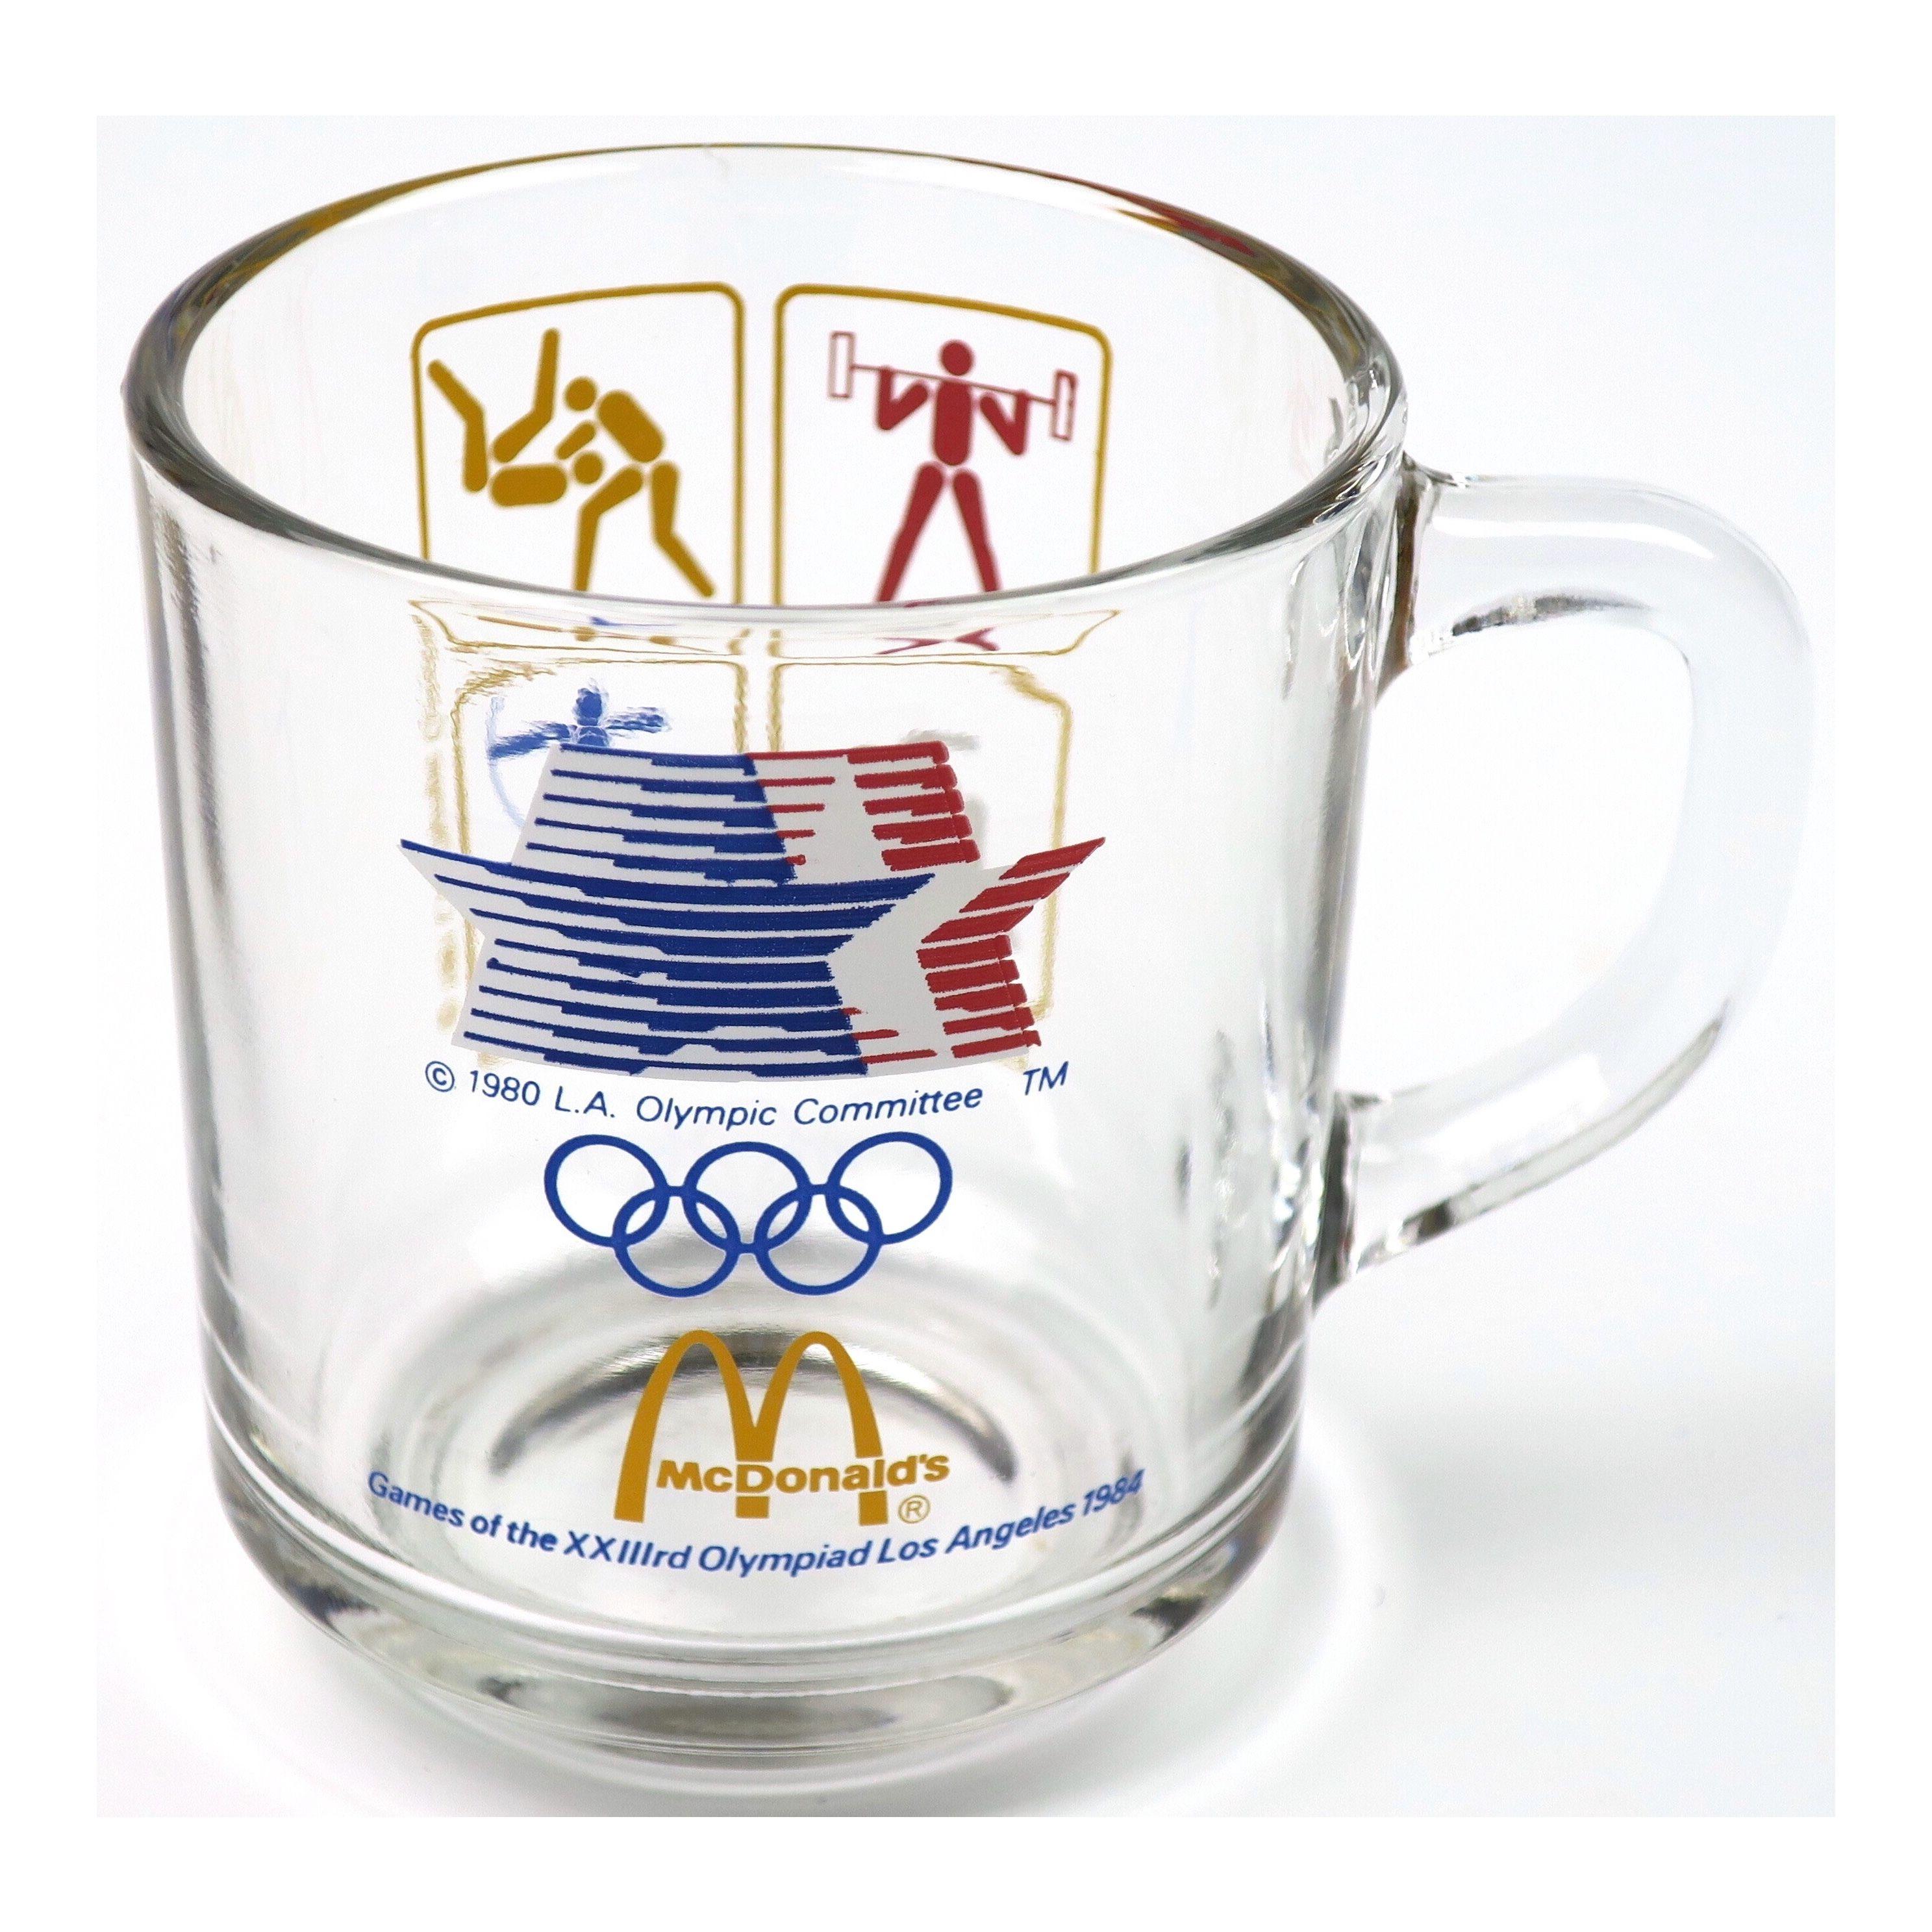 ANCHOR HOCKING(アンカーホッキング) 84 ロサンゼルスオリンピック マクドナルドマグ